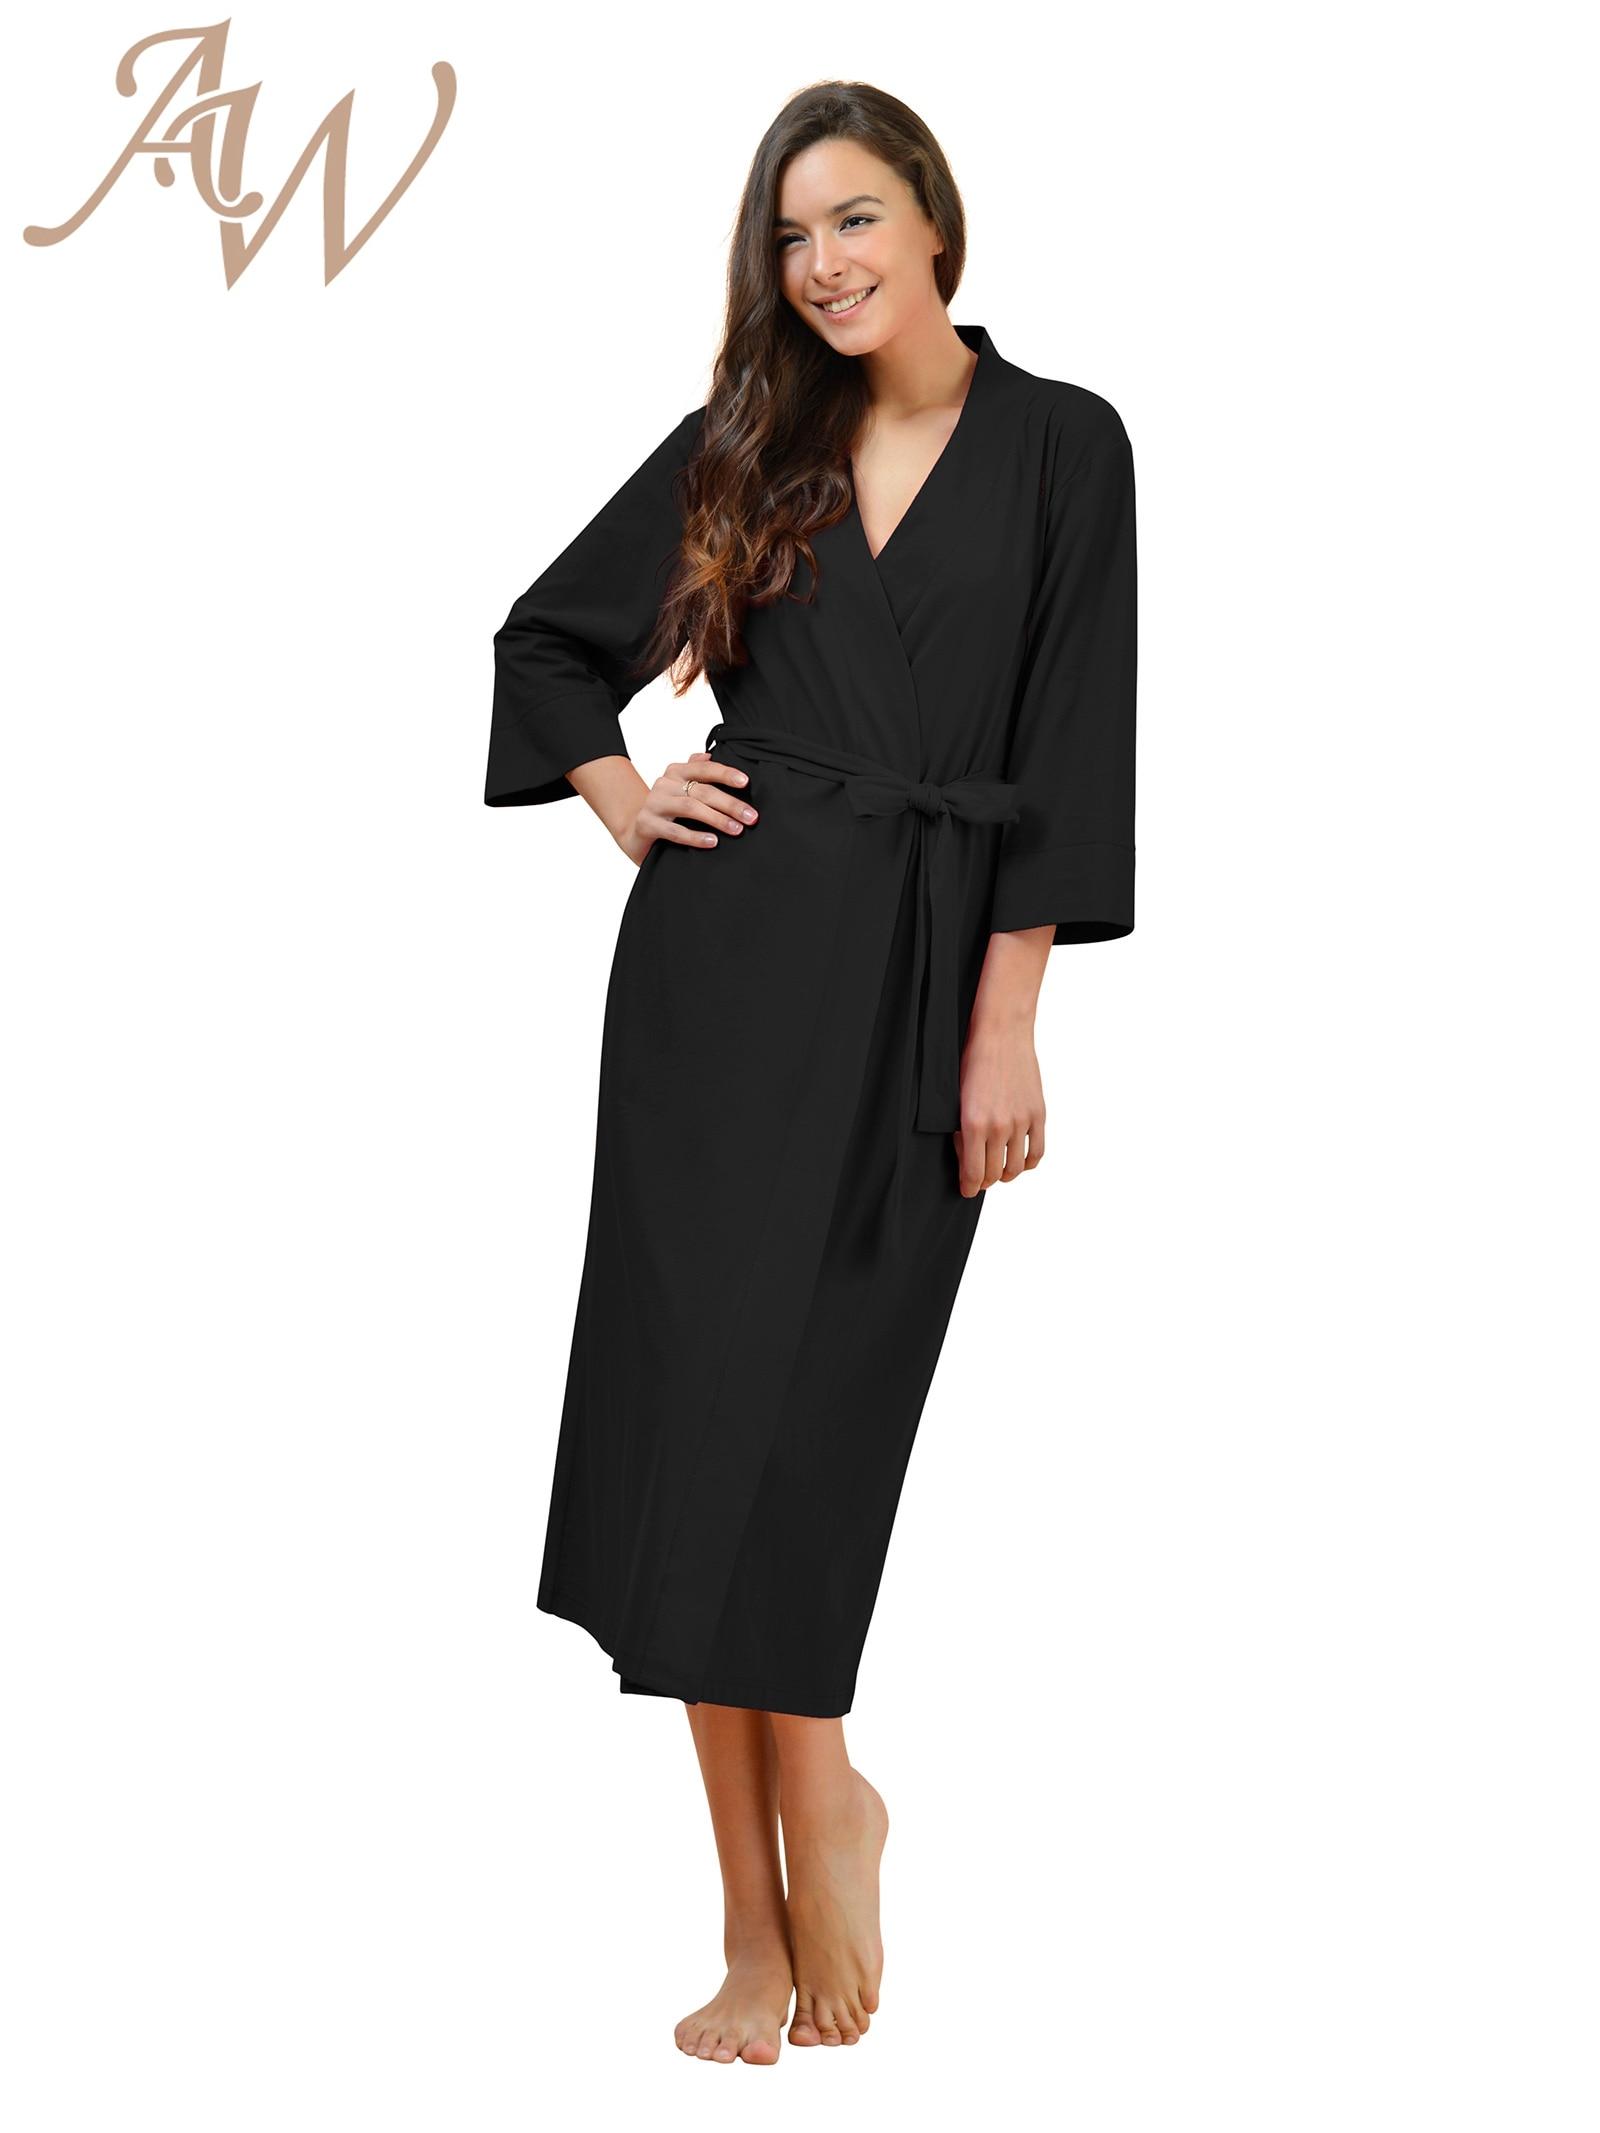 Cotton Robes Soft Kimono Robe Long Knit Bathrobe Nightwear Lightweight  Loungewear Nightdress V-neck Sexy Sleepwear for women a5722e988